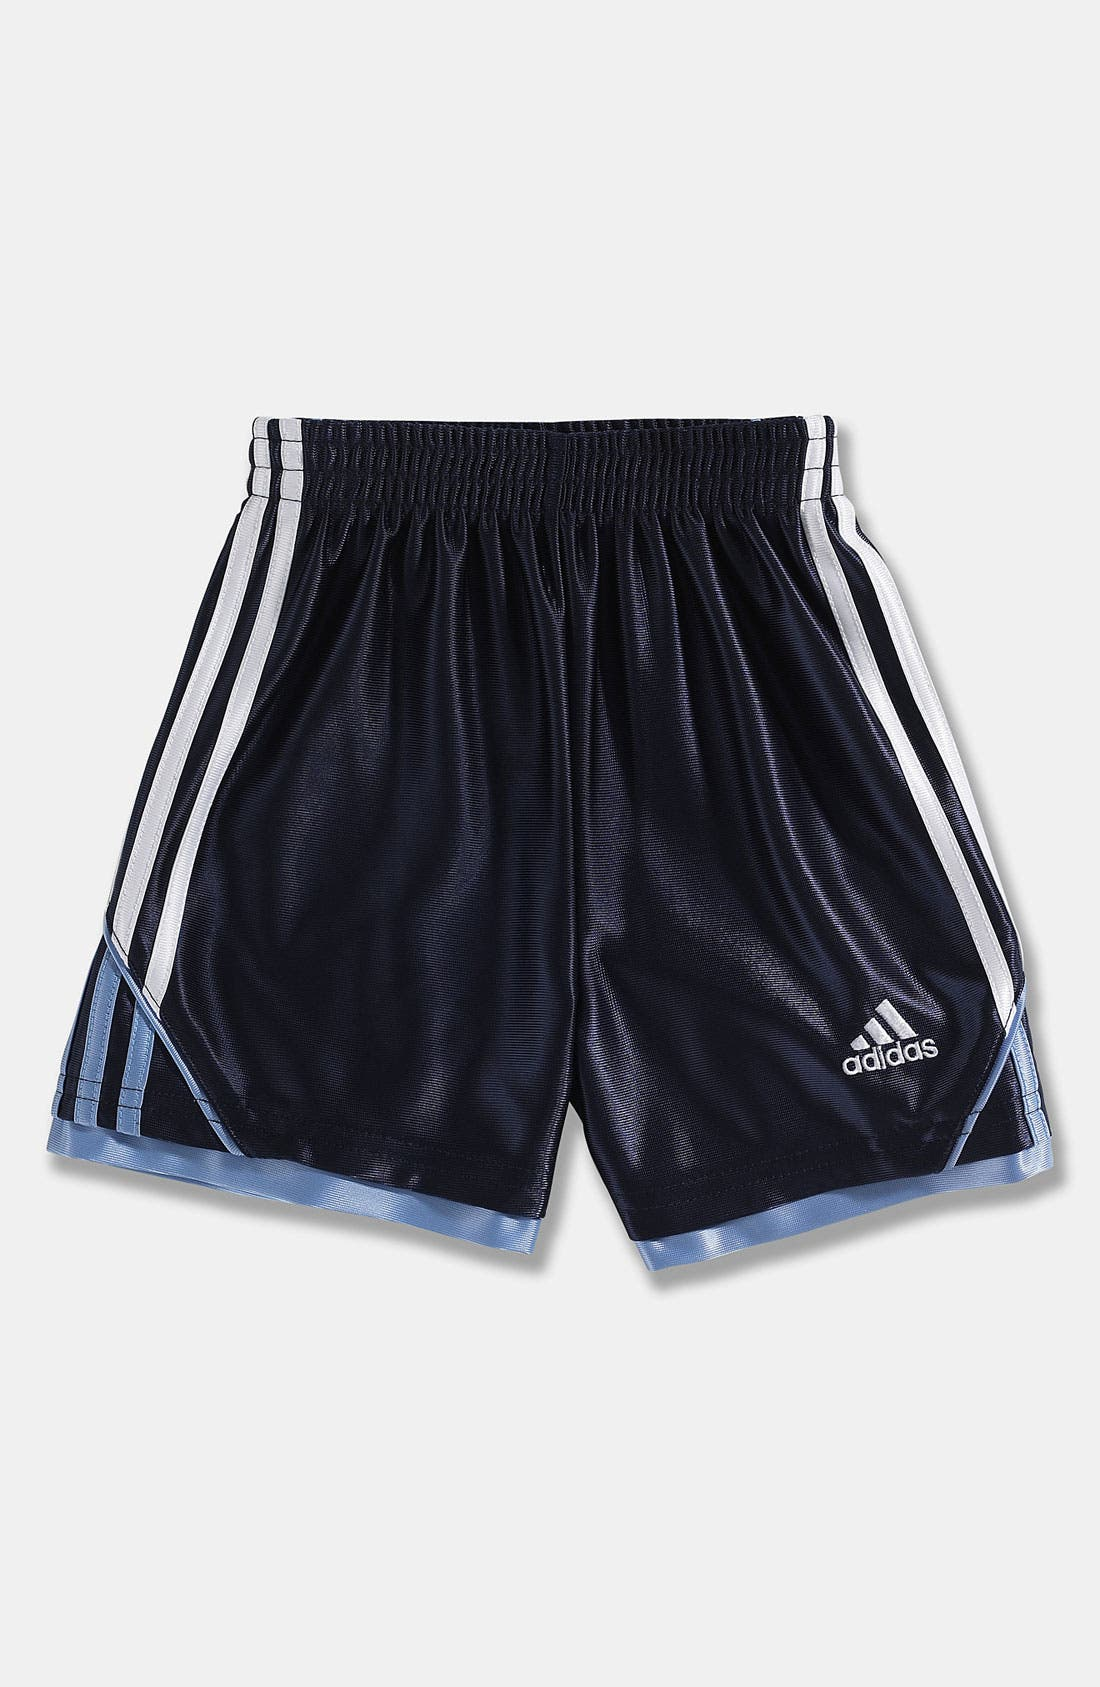 Alternate Image 1 Selected - adidas 'Prime Dazzle' Shorts (Toddler)